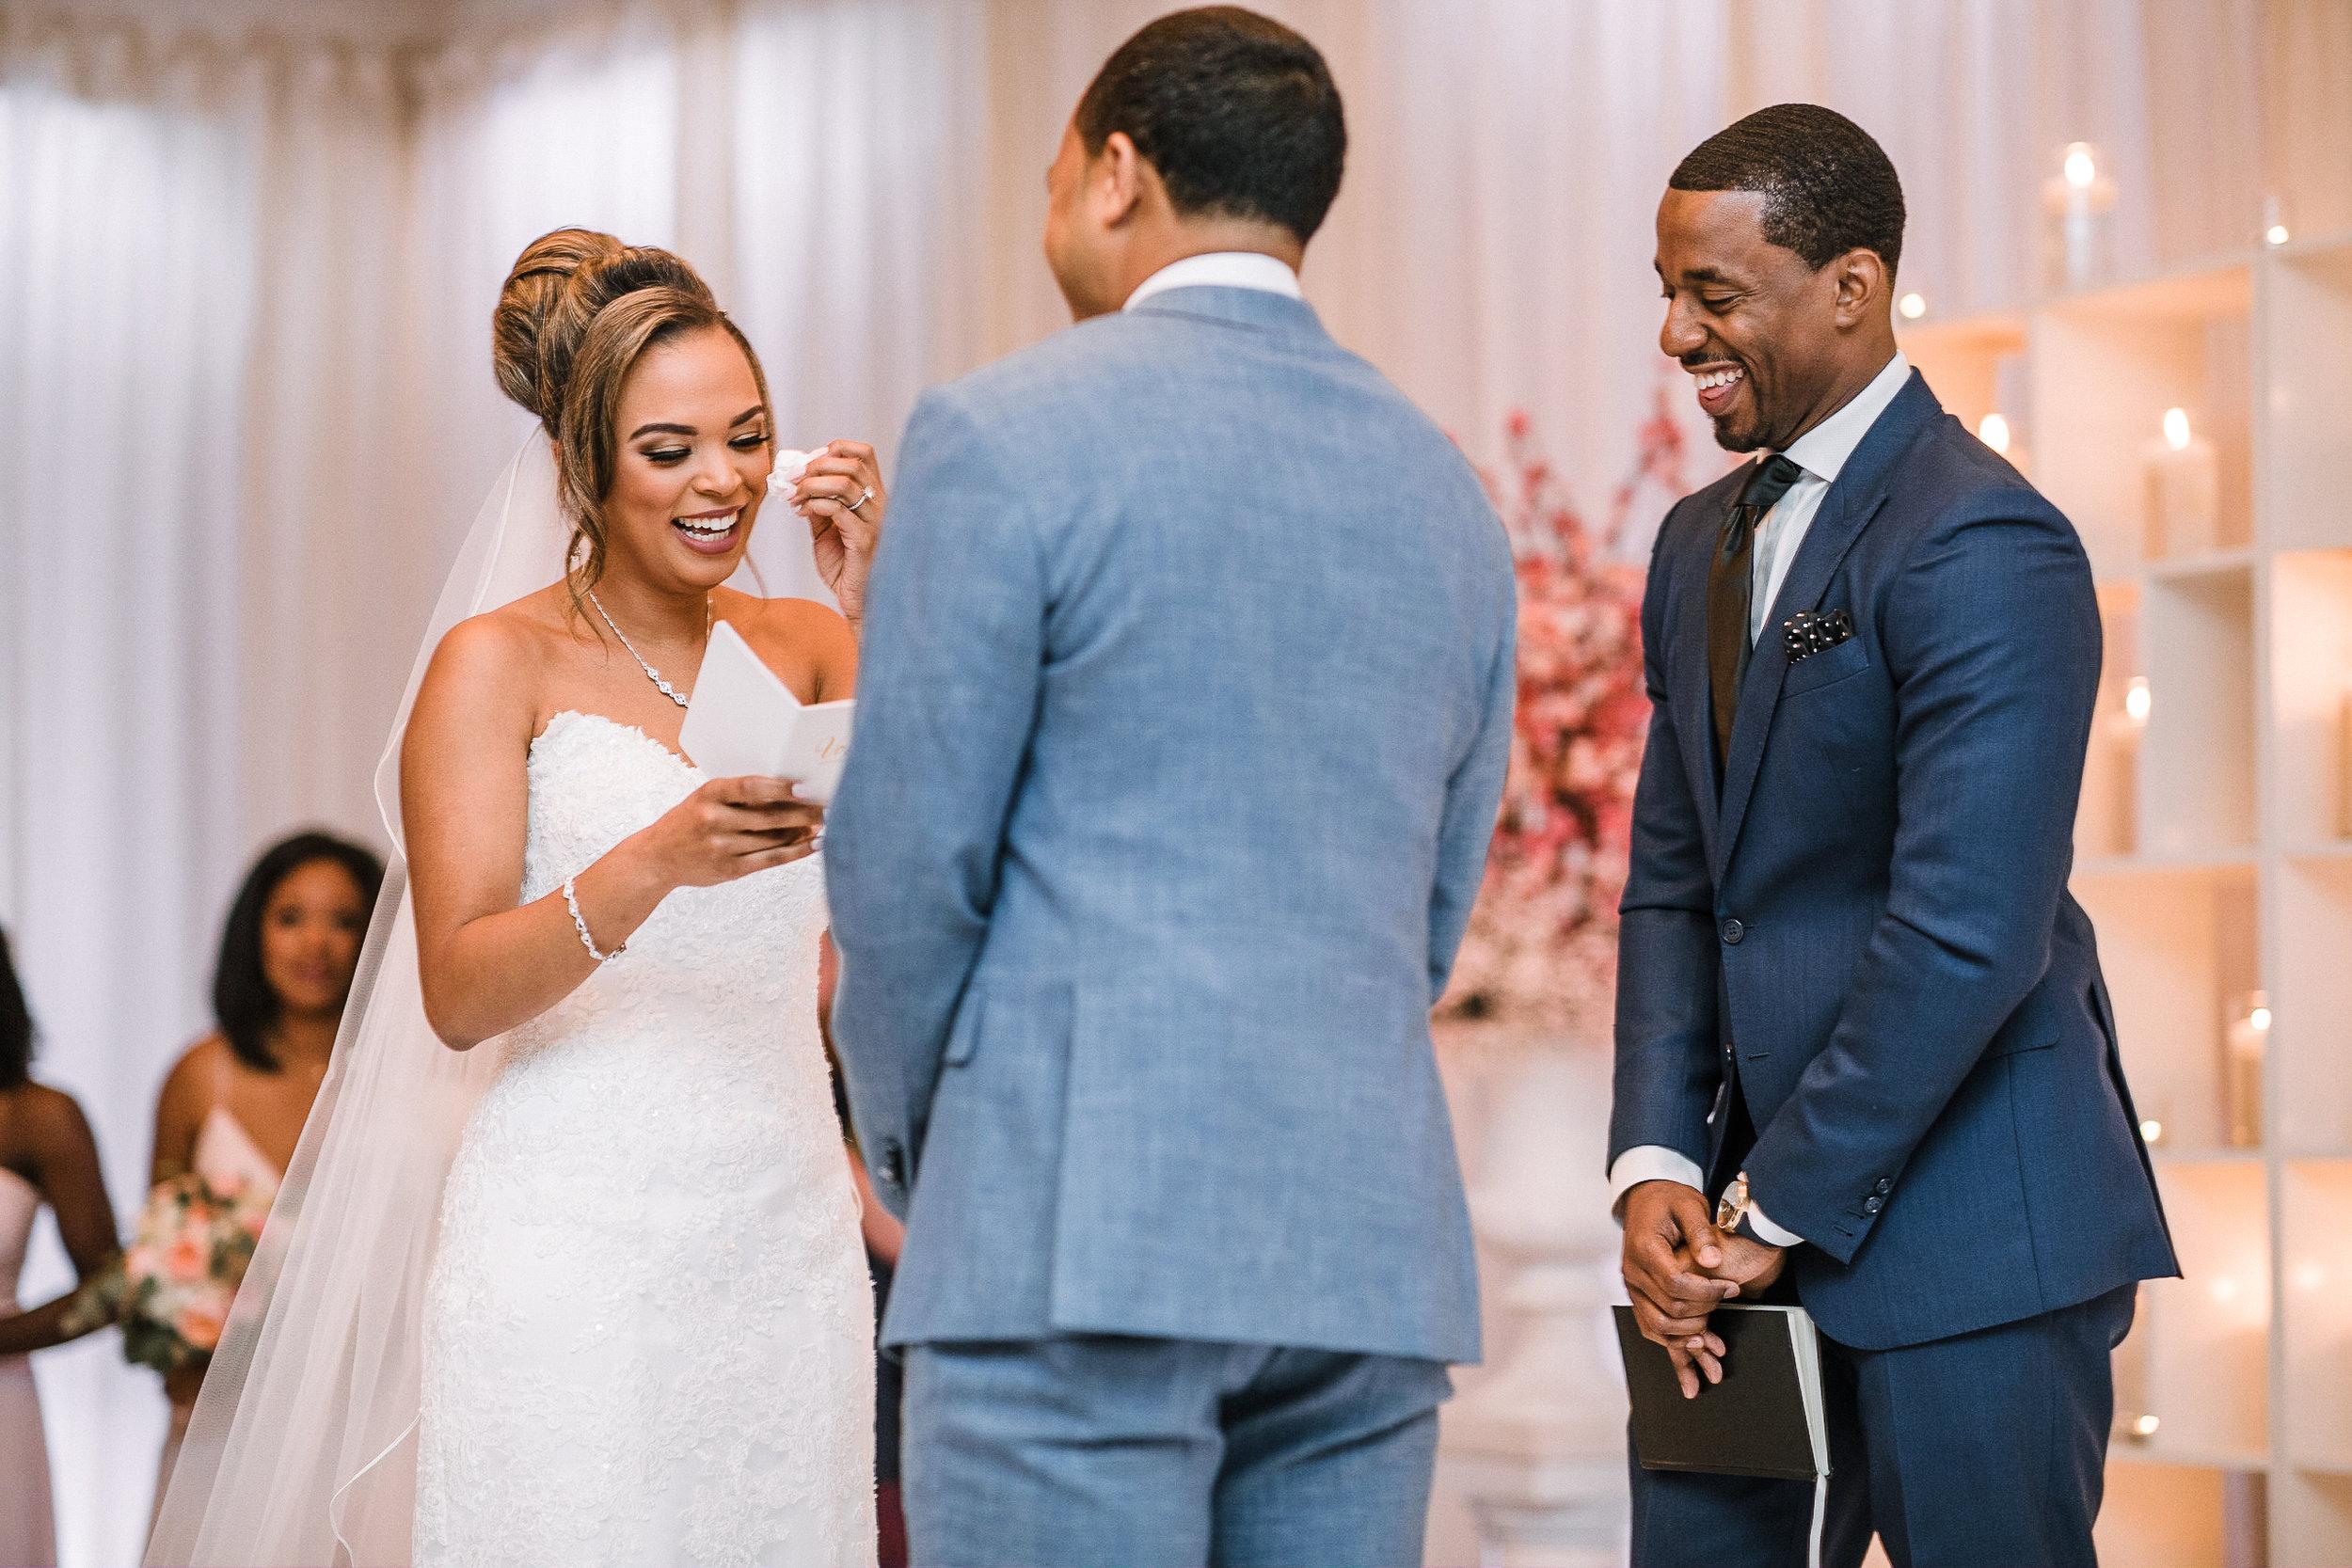 bride reading vows at The Park Hyatt Hotel in Washington DC